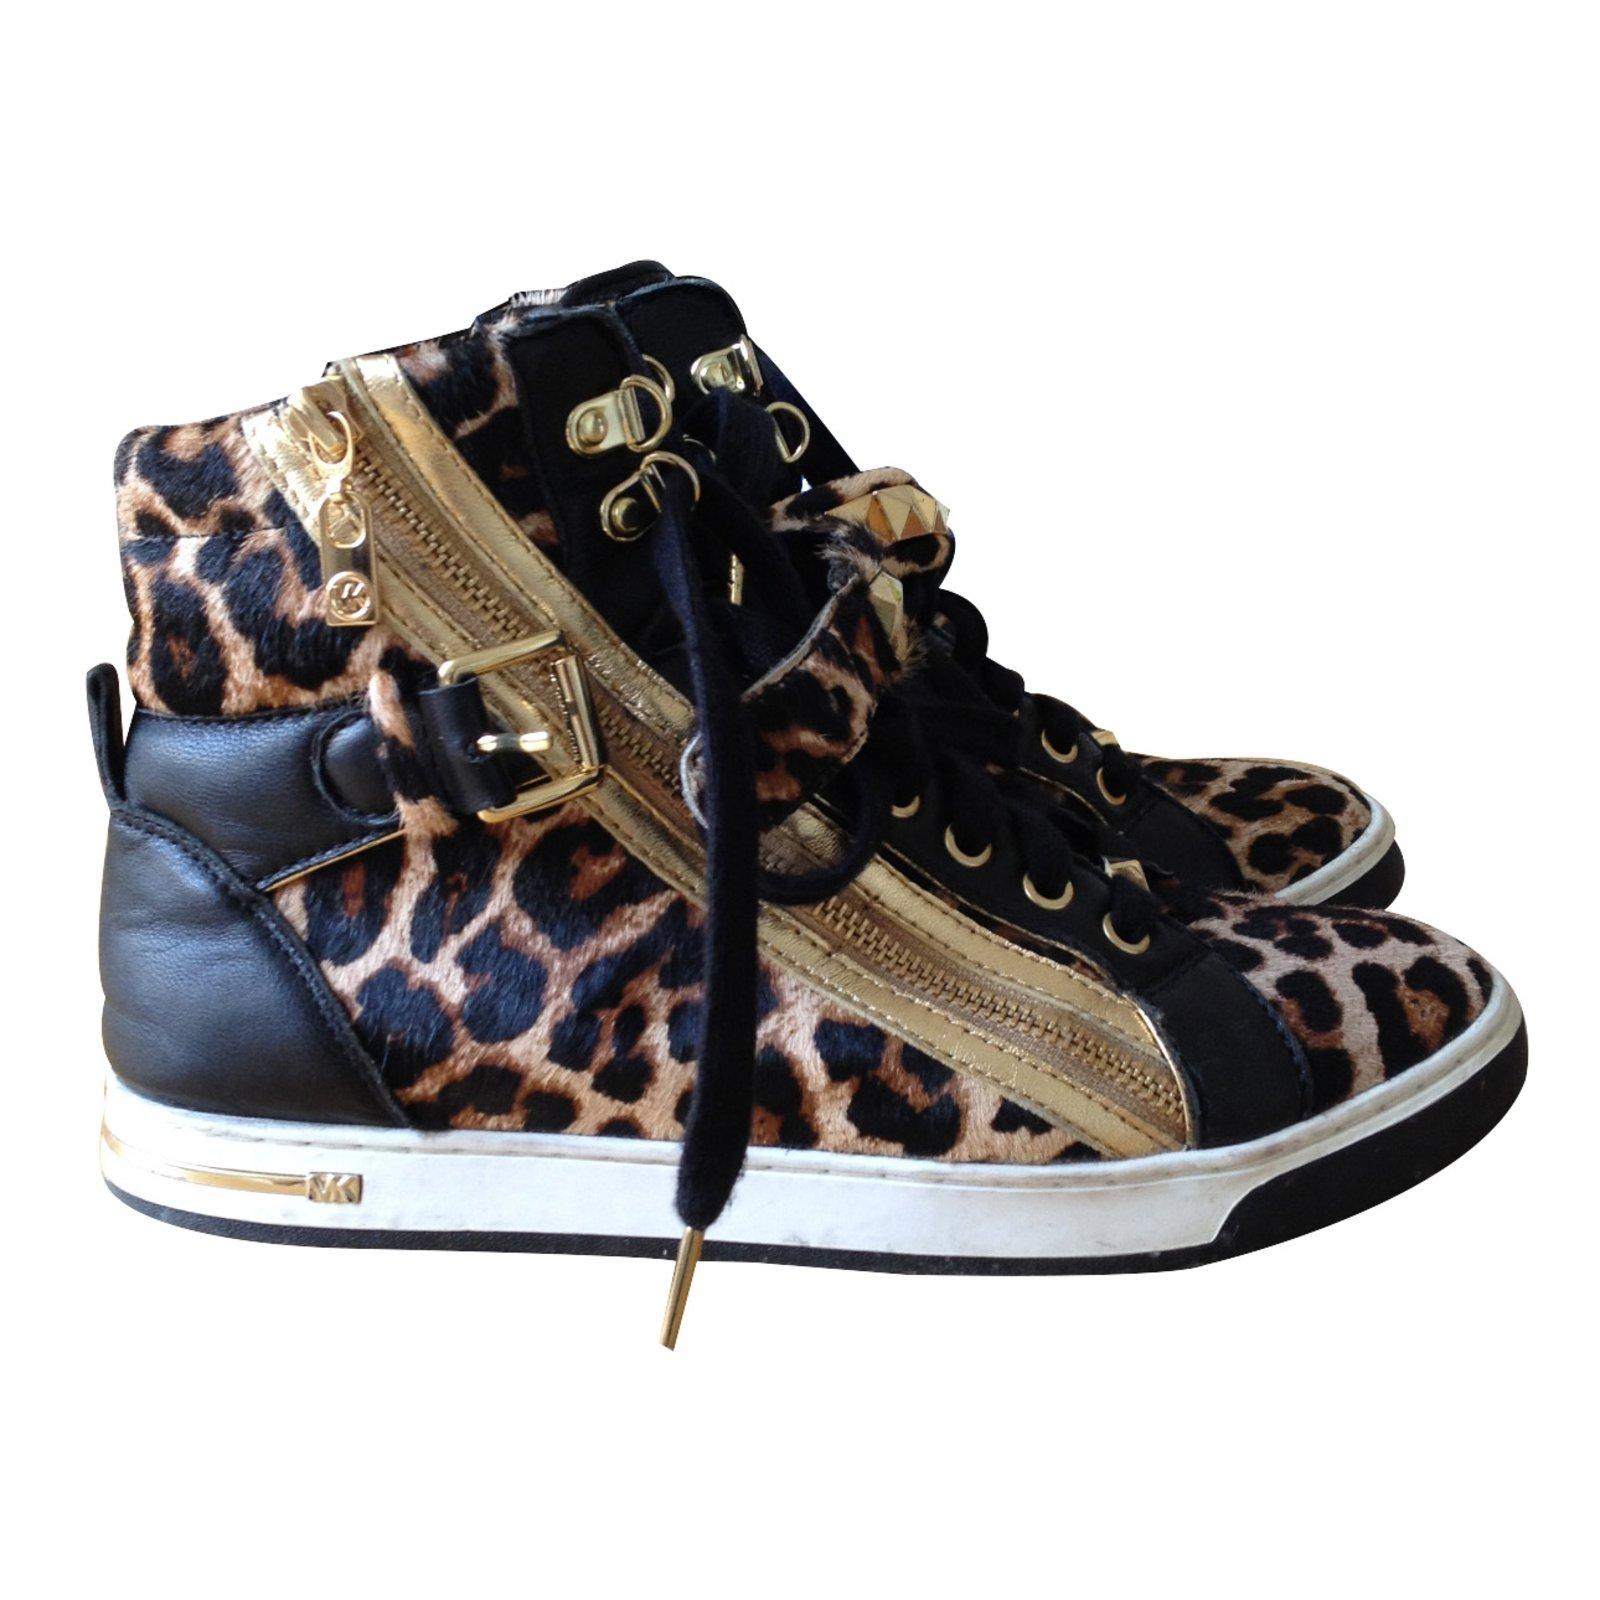 540fc798962e Michael Kors Sneakers Sneakers Leather Leopard print ref.13547 ...